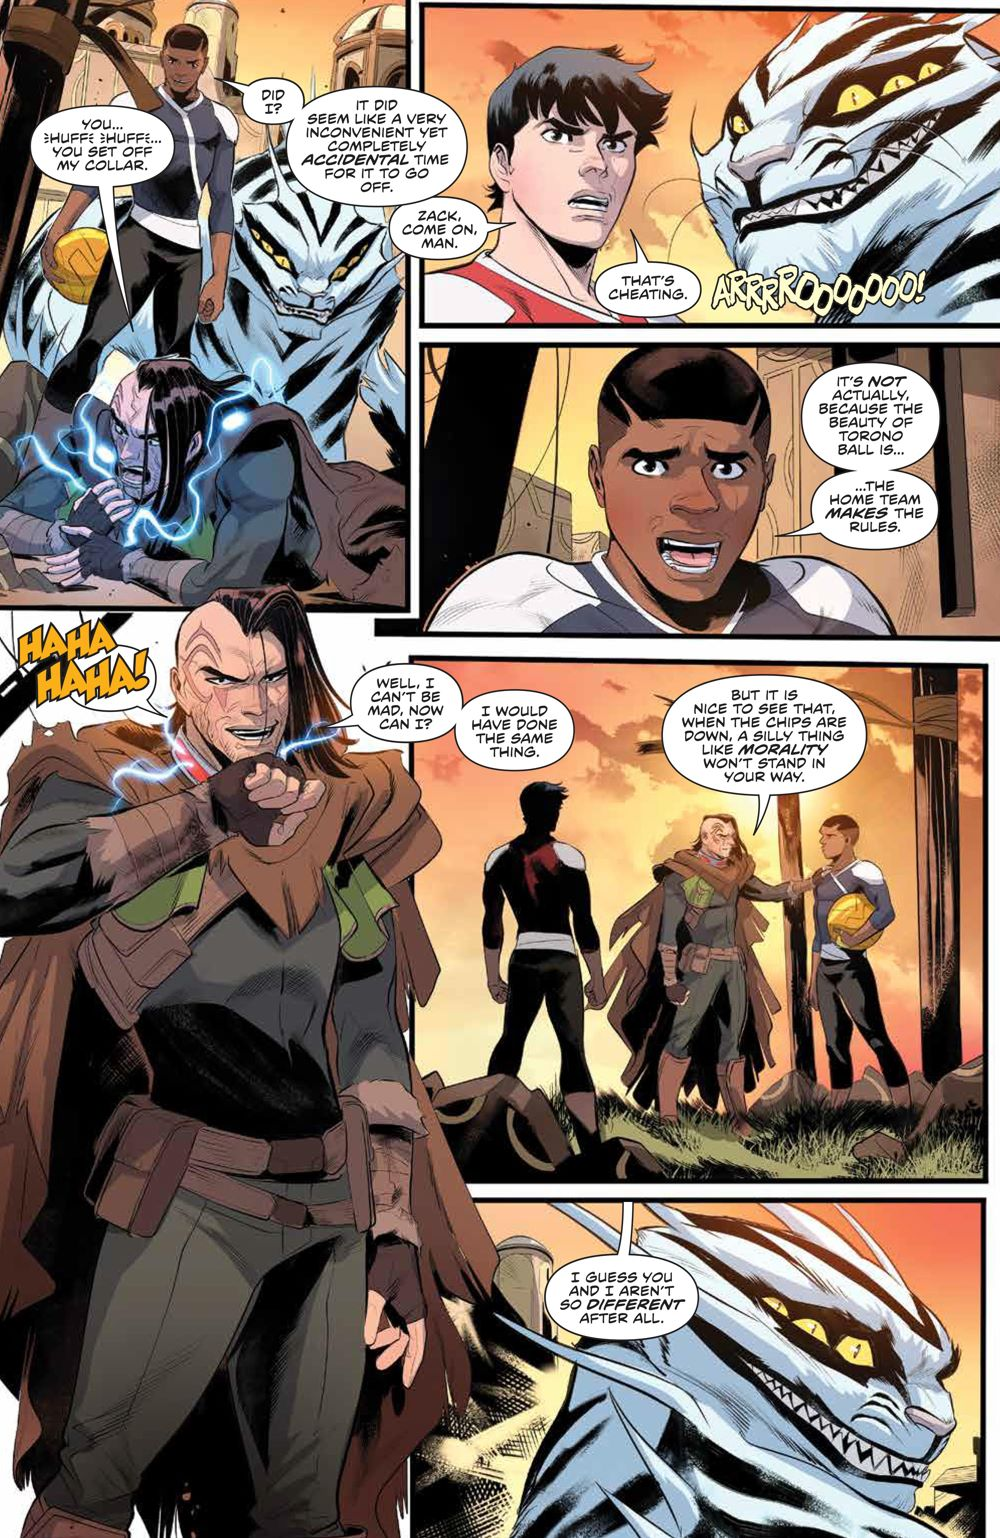 PowerRangers_007_PRESS_6 ComicList Previews: POWER RANGERS #7